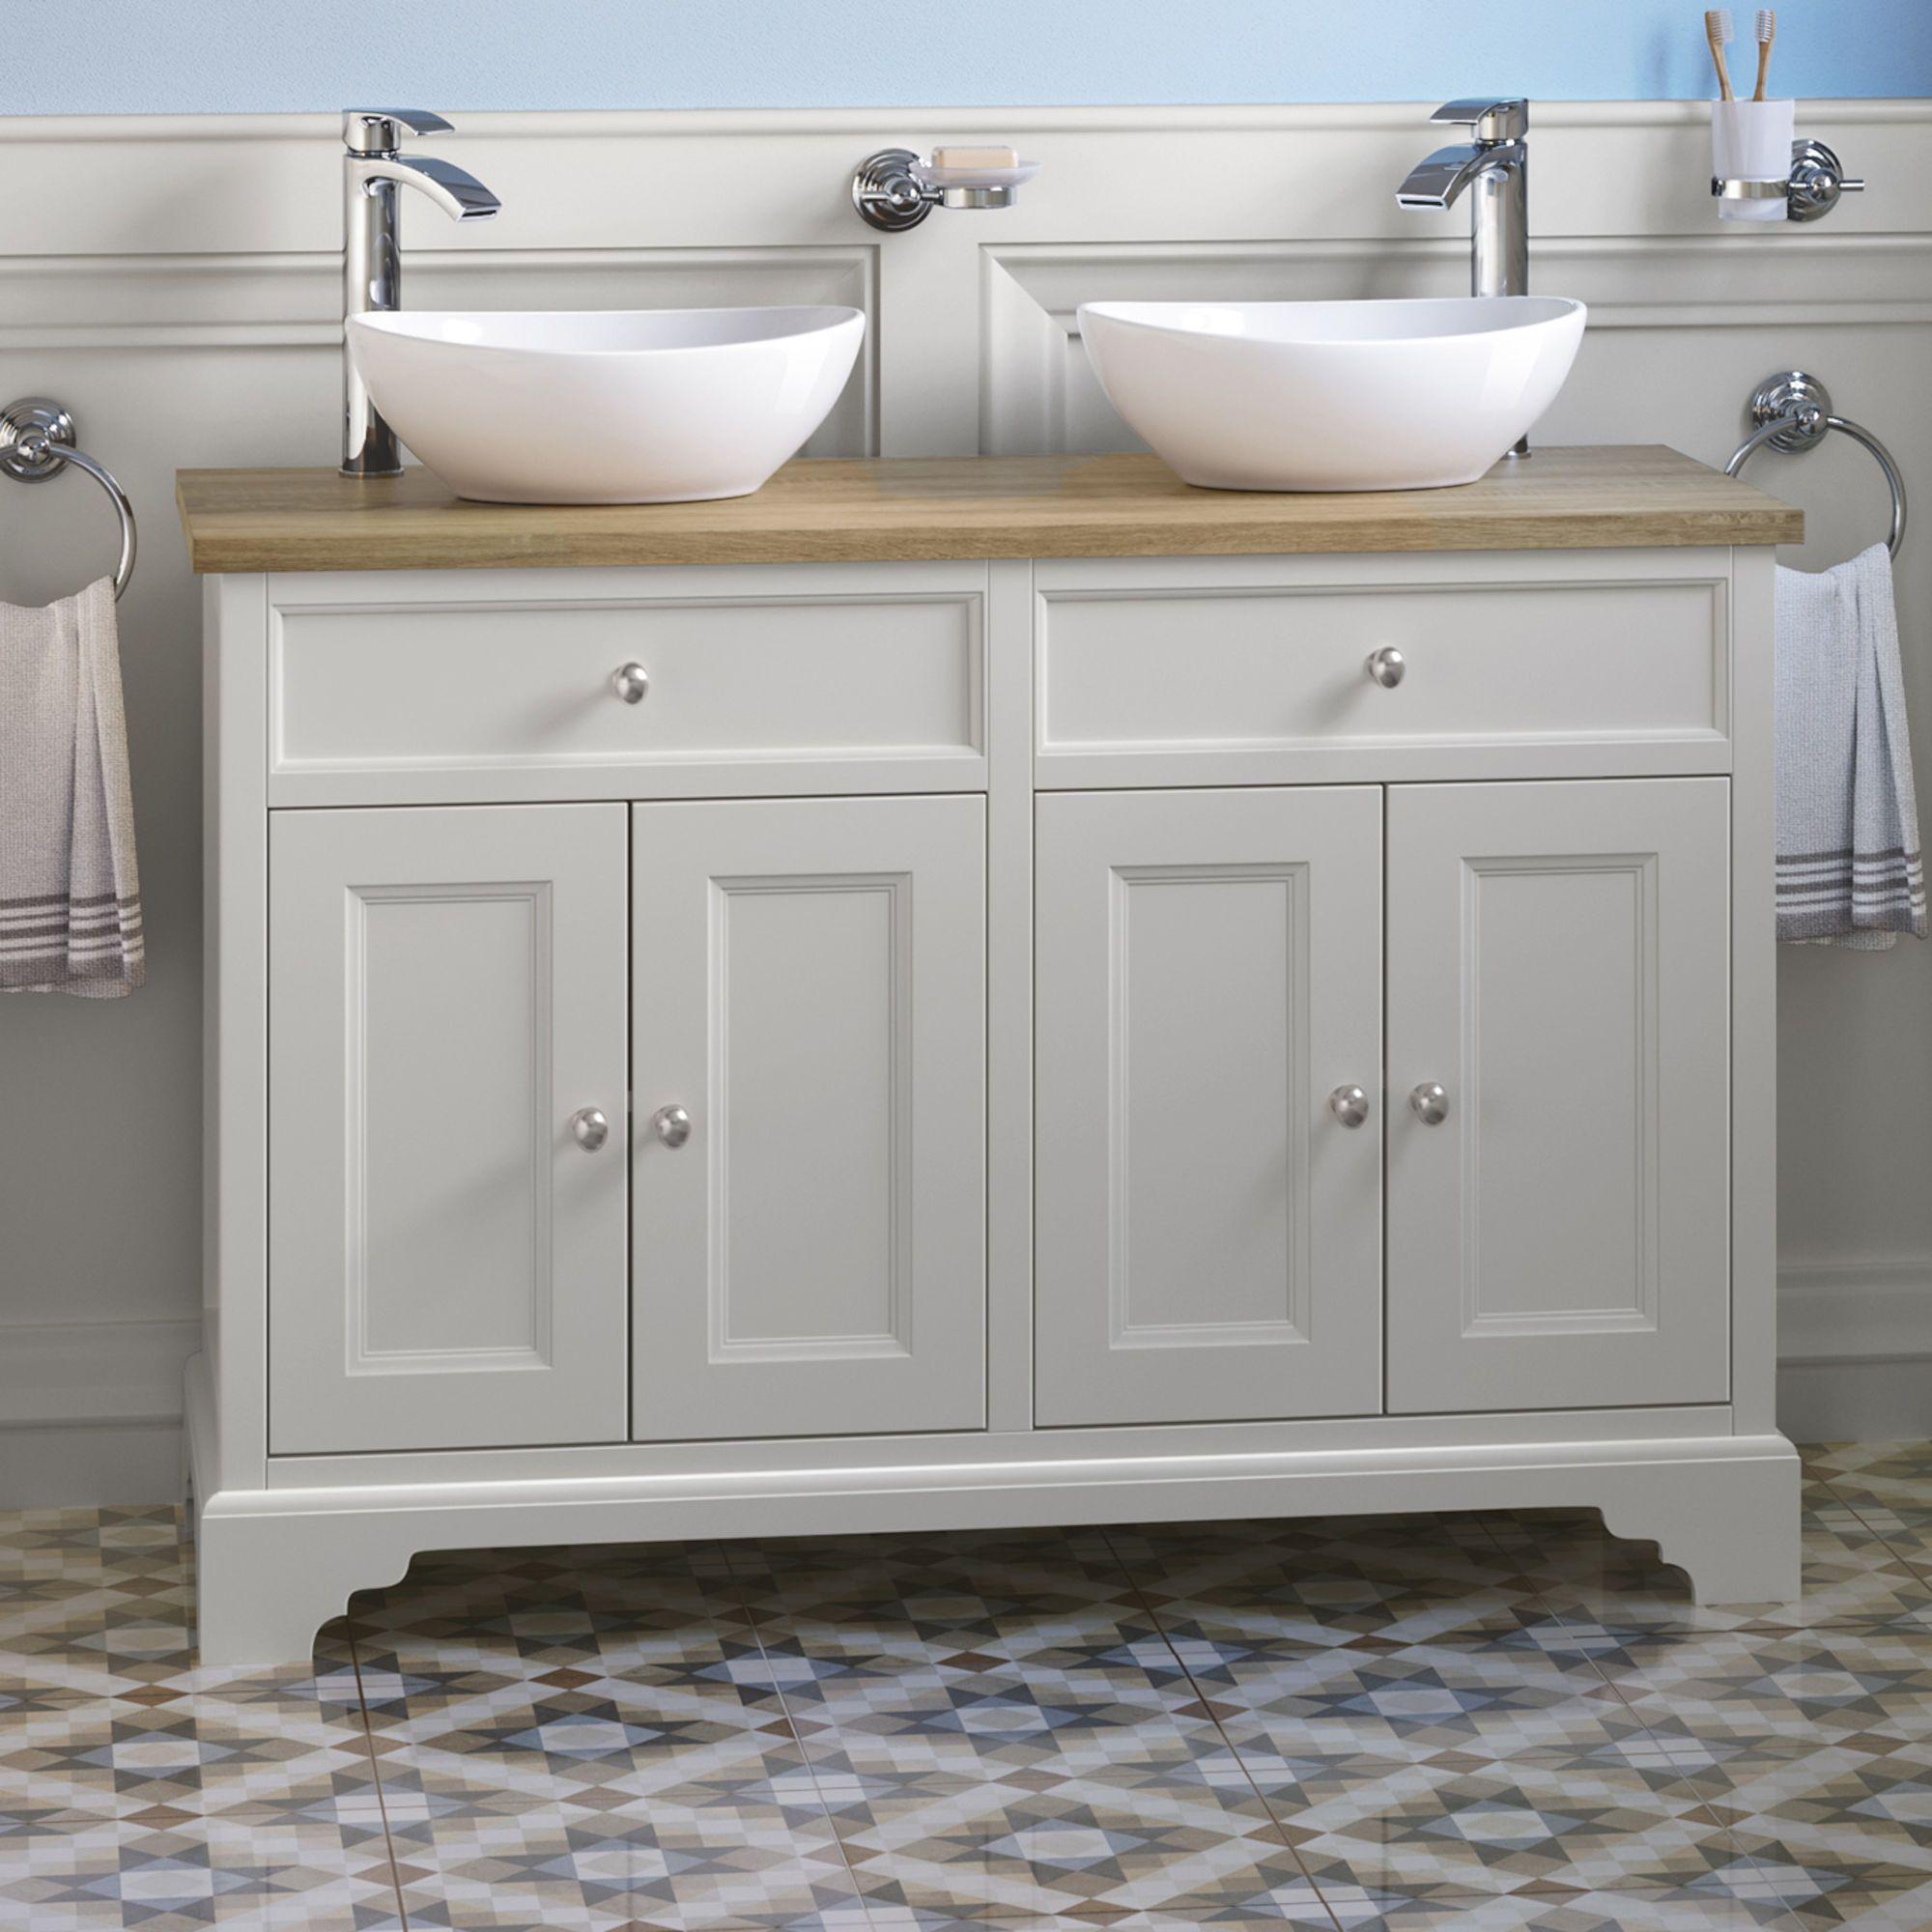 1200mm Loxley Chalk Countertop Unit Double Camila Basin Floor Standing Soak Com Vanity Units Double Vanity Unit Basin Vanity Unit